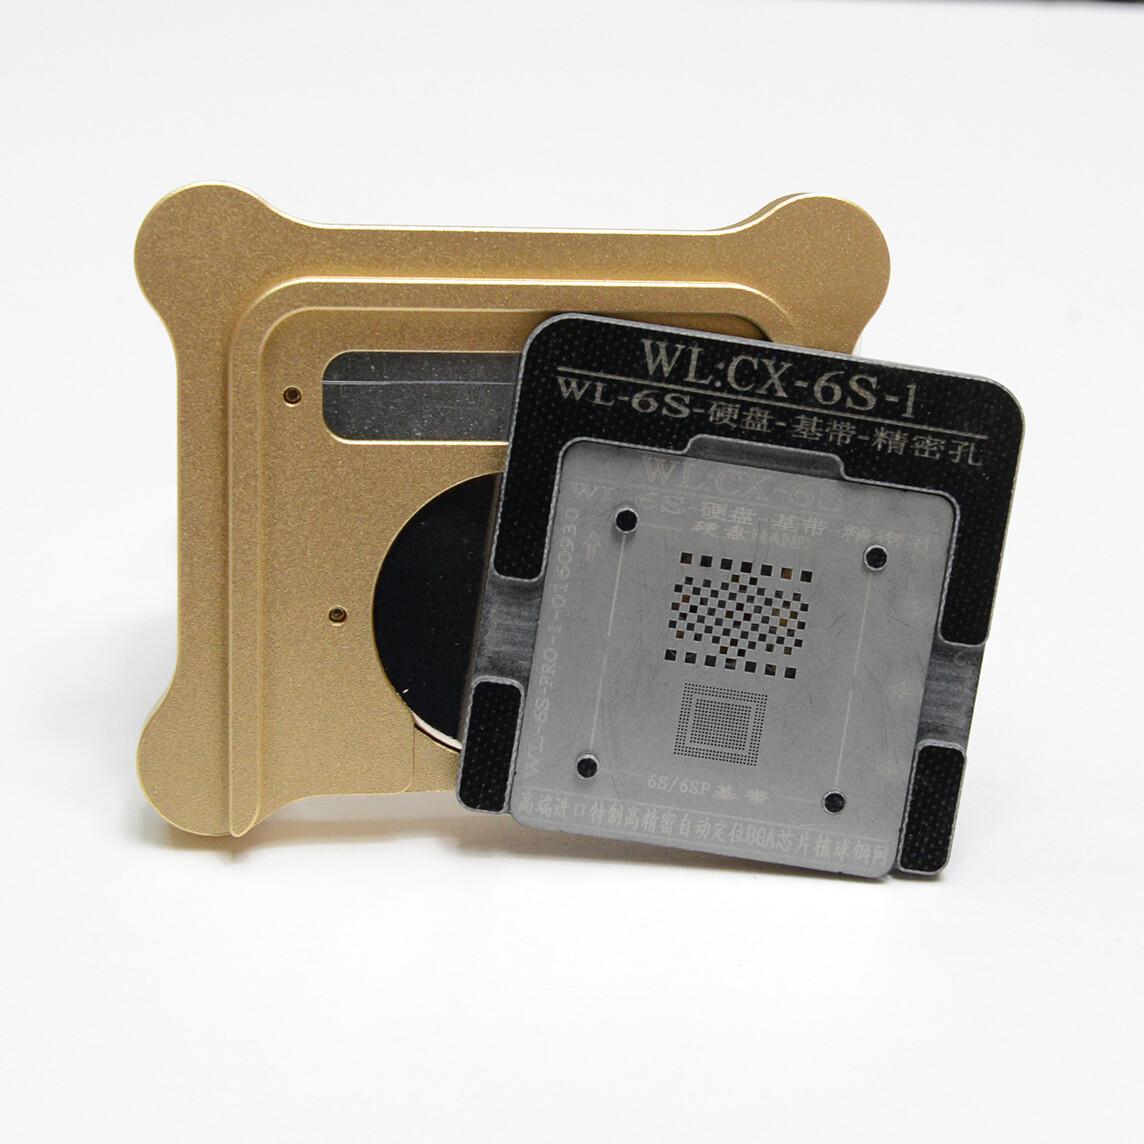 Stencil nand iPhone 6s-6s plus con base magnetica